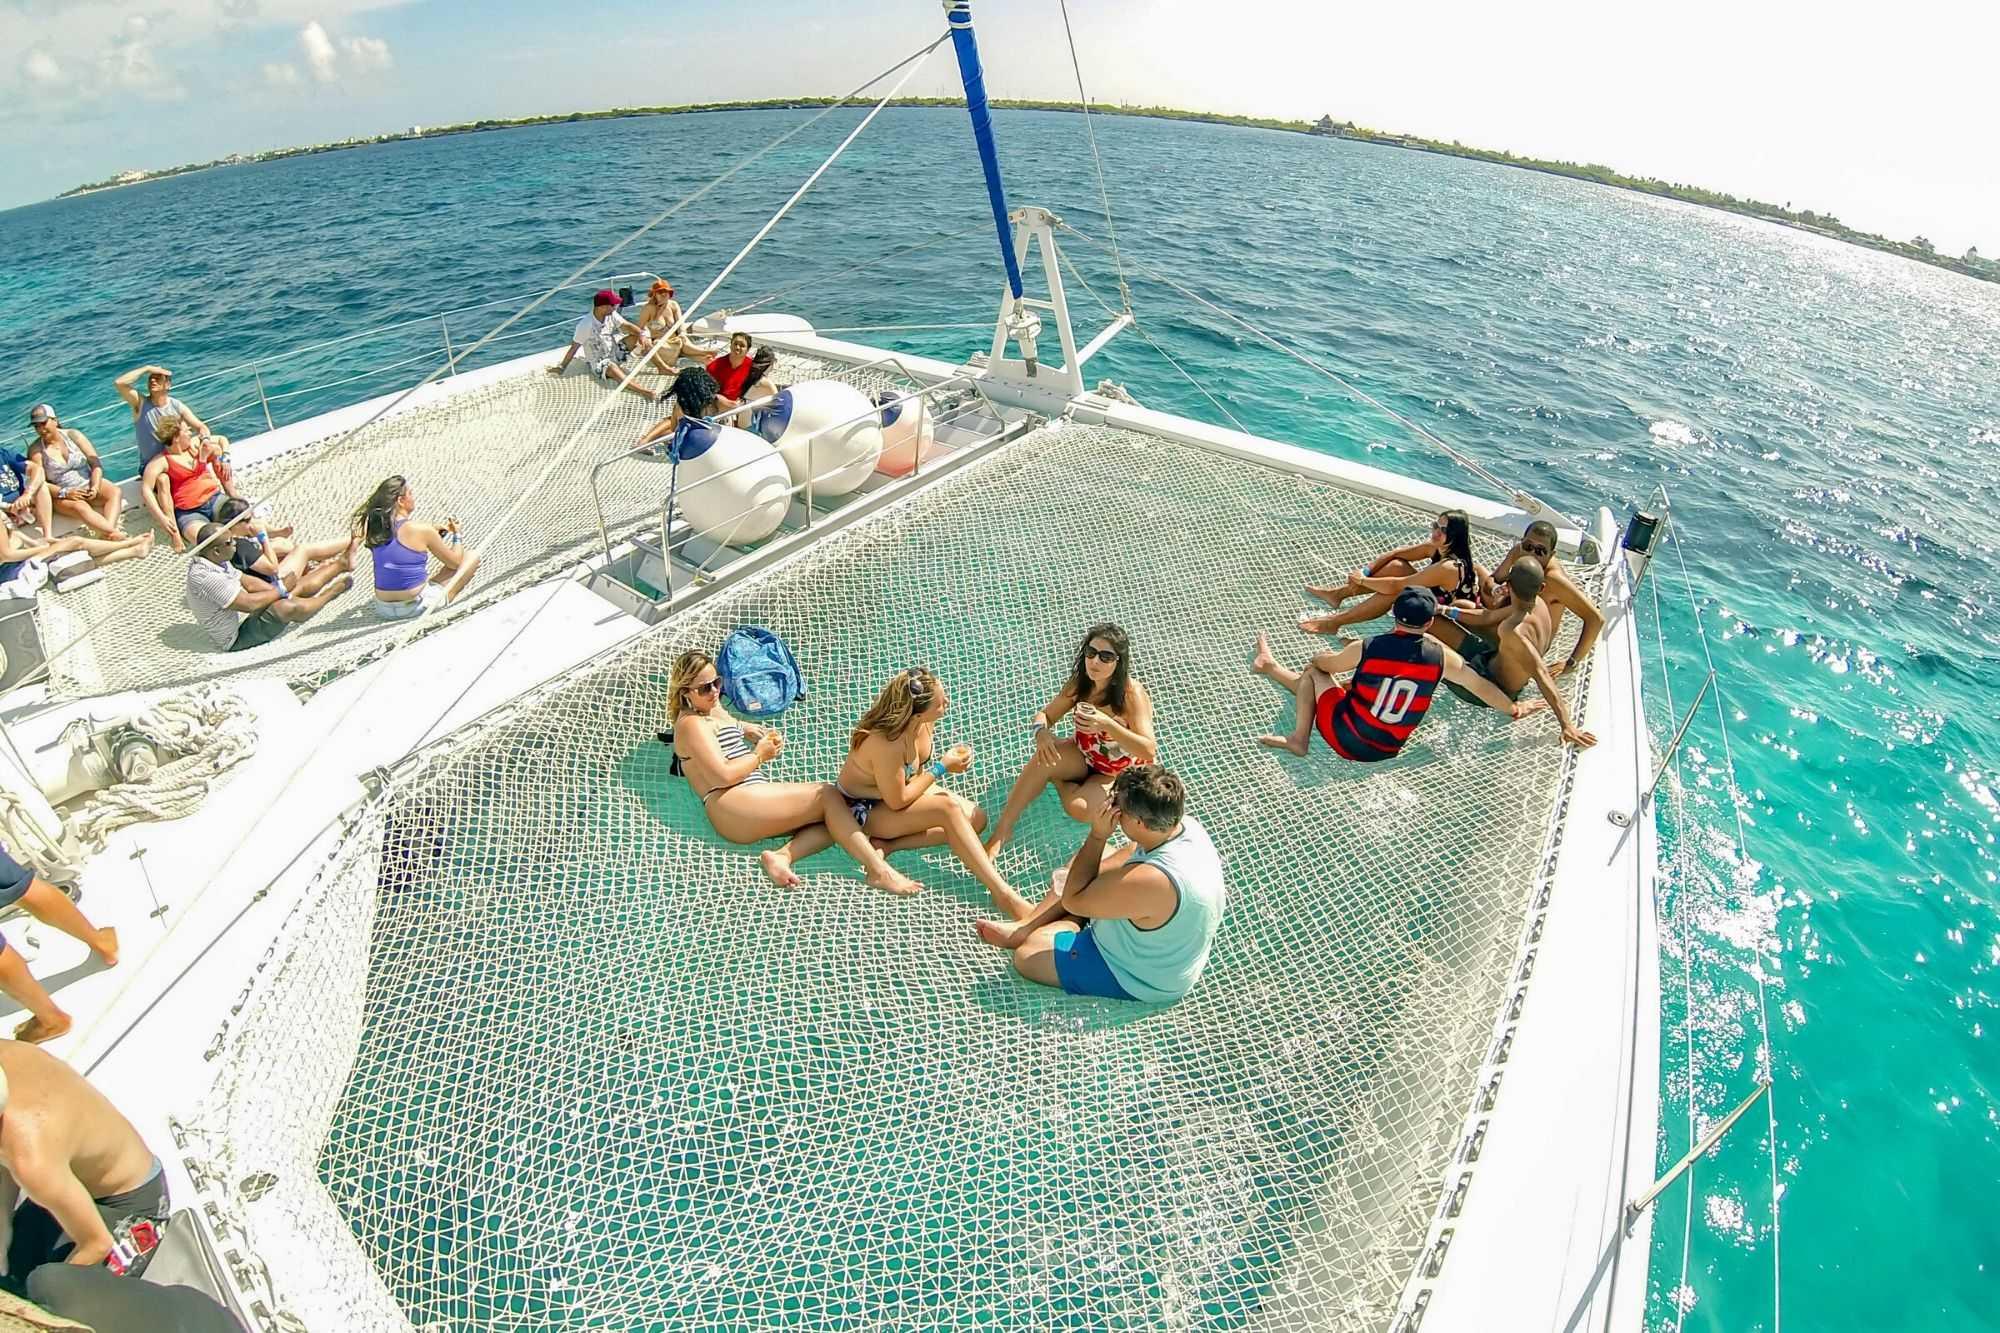 4 Private Isla Mujeres tour in catamaran - Sea Passion I II - Cancun Sailing